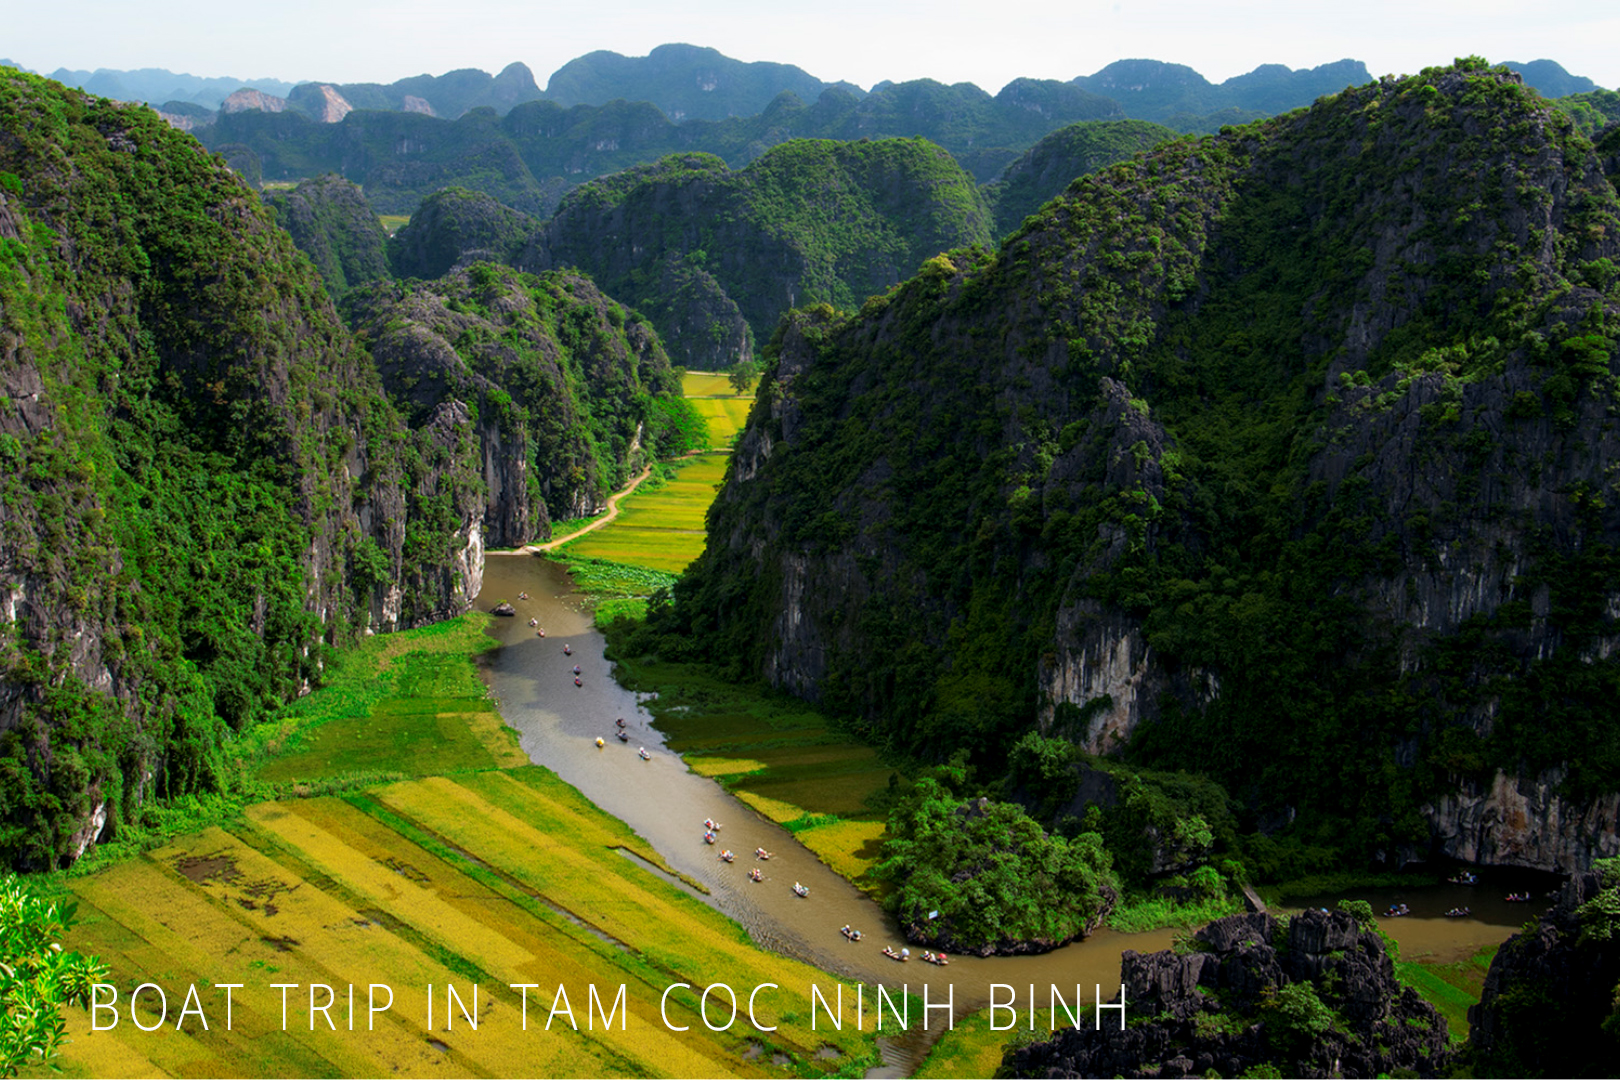 Trang An Boat Trip Vietnam, tam coc boat ride